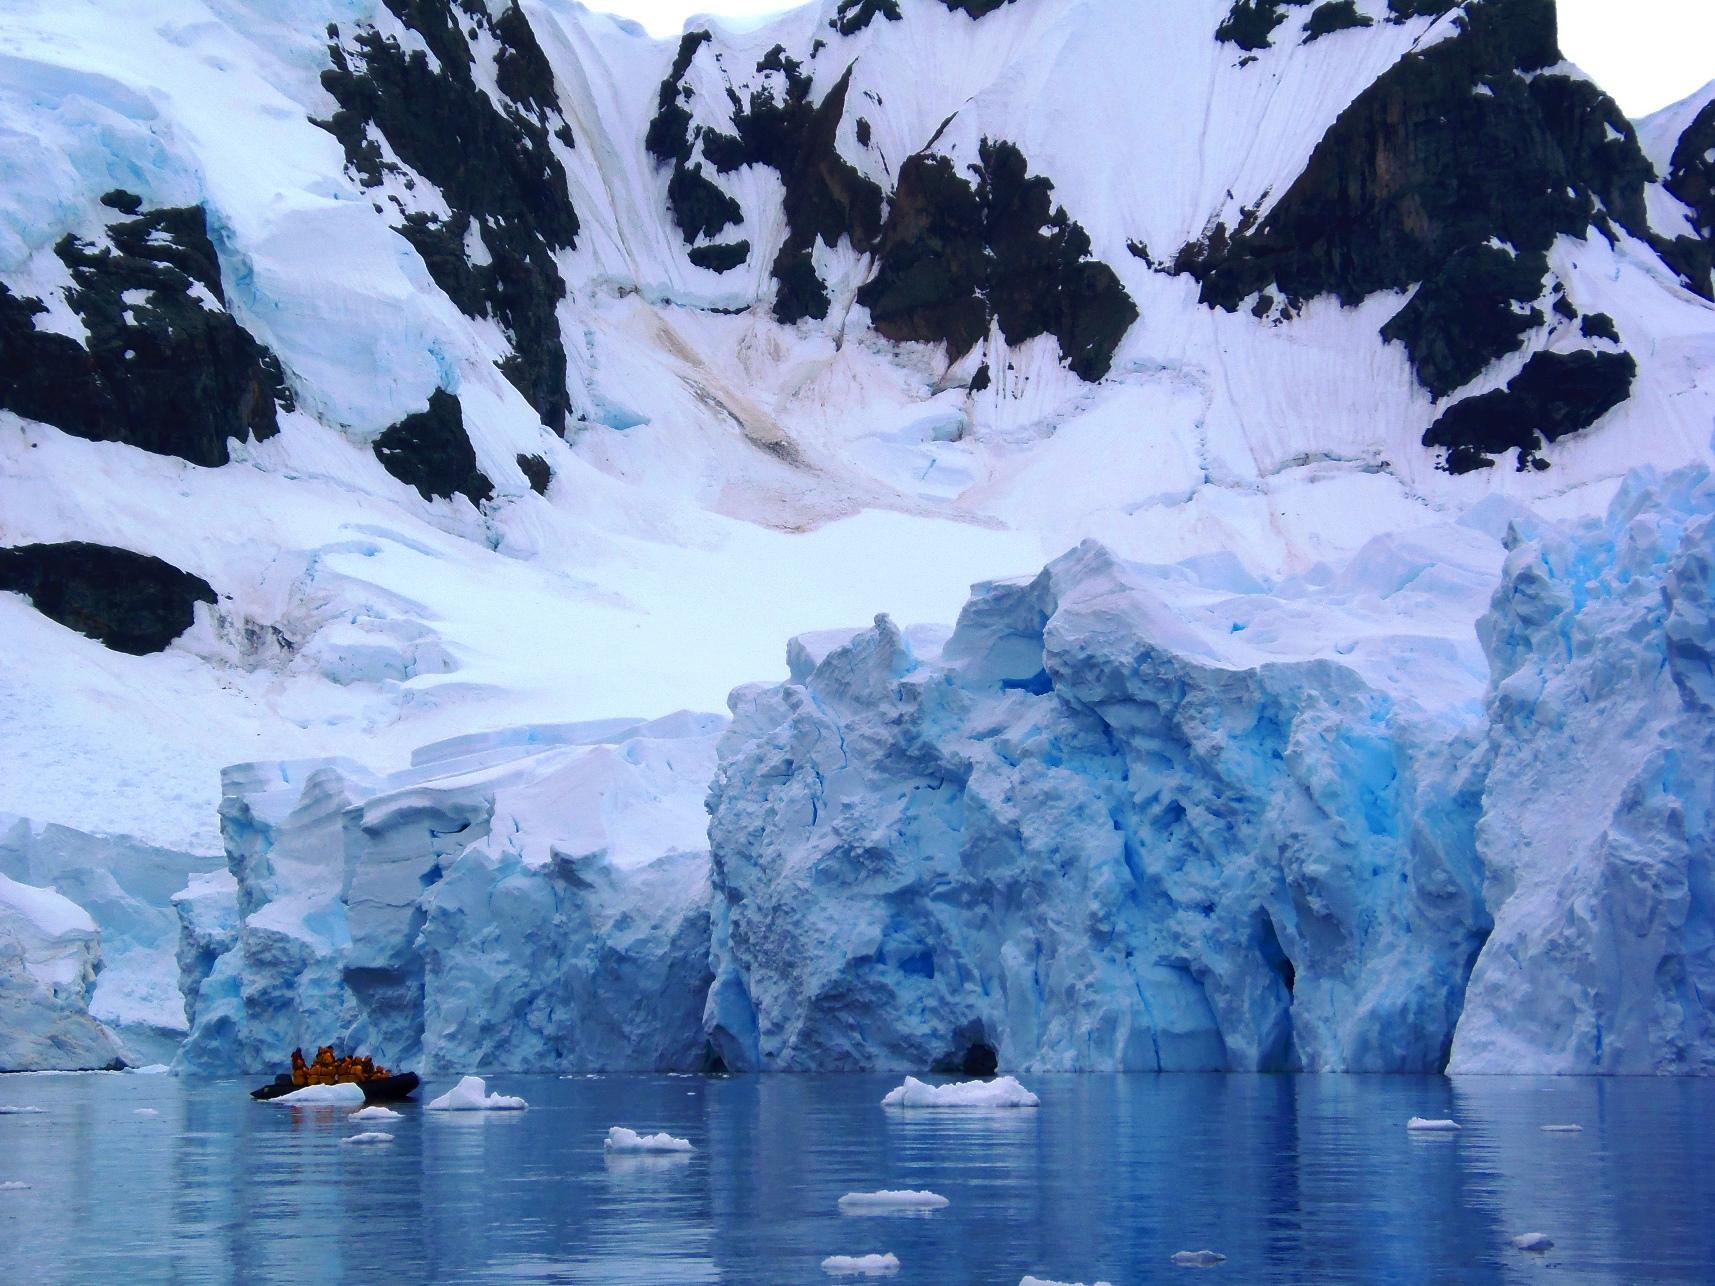 2月9日出発「南極半島探検クルーズ 16日間」